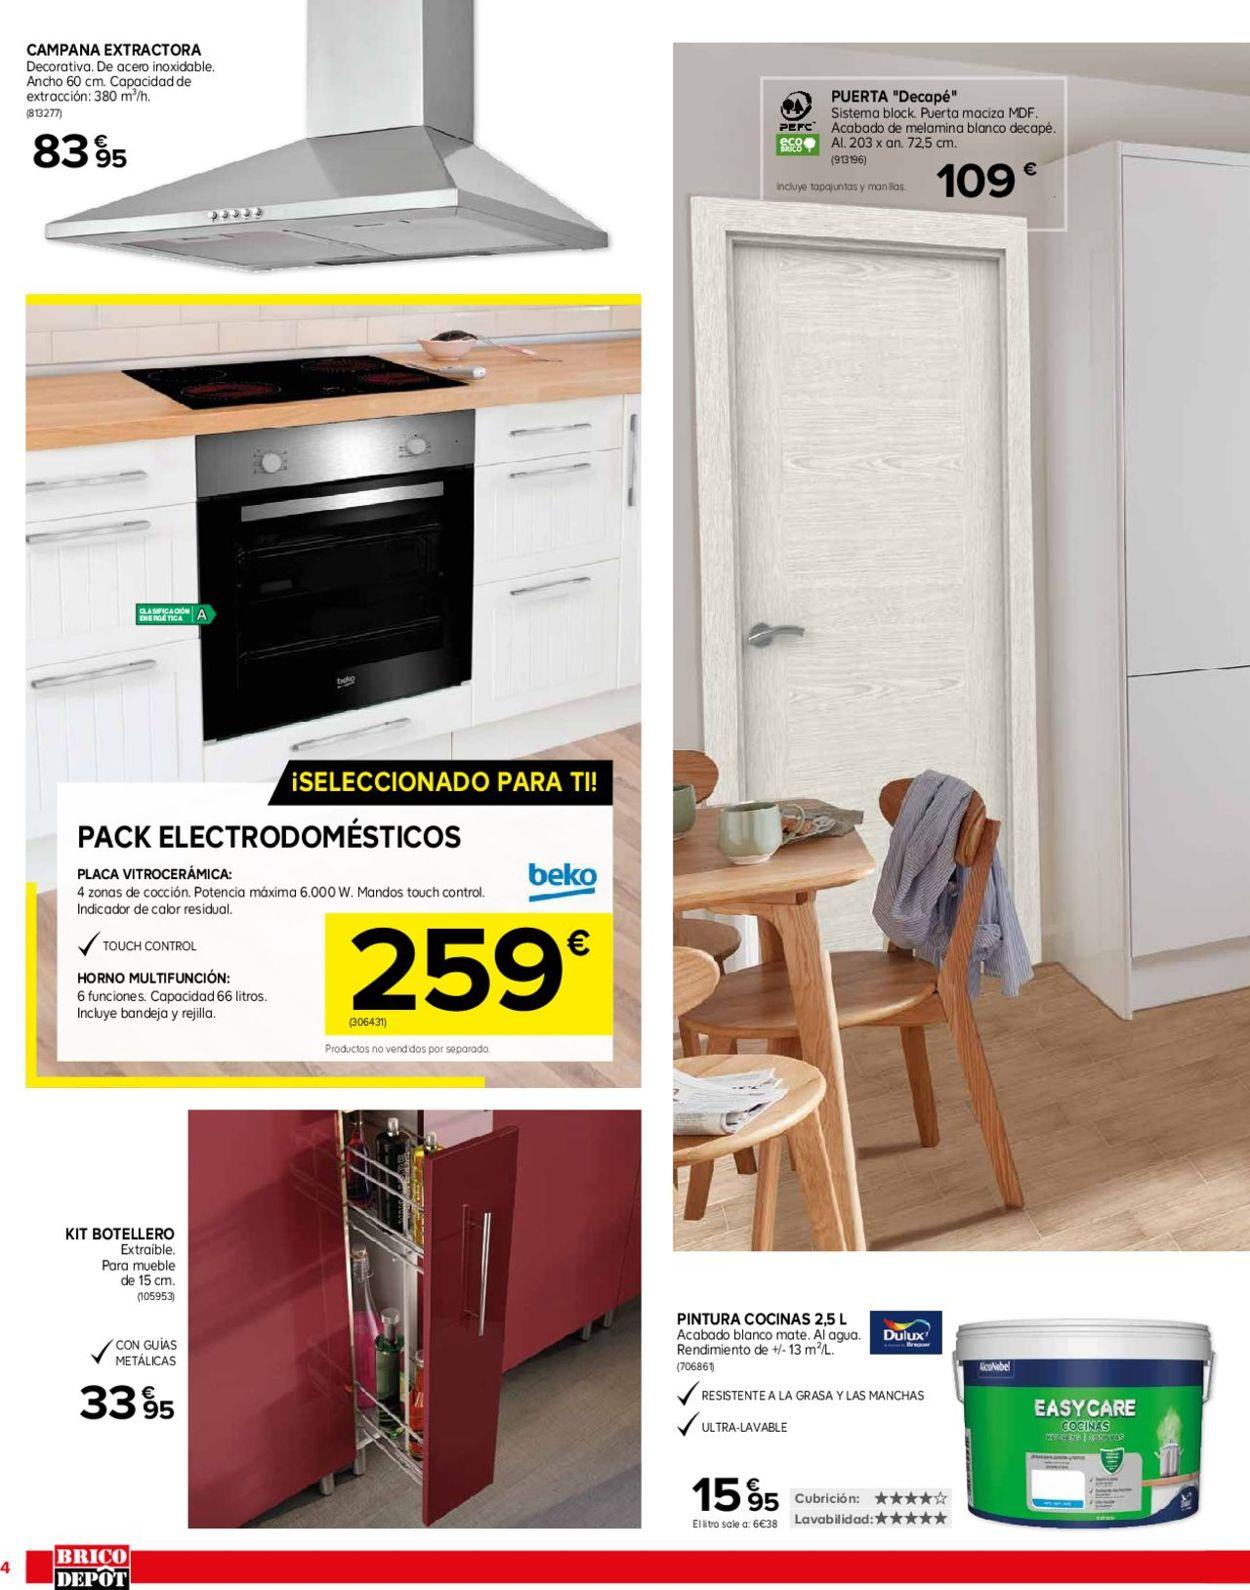 Brico Depôt Folleto - 26.07-04.08.2019 (Página 4)